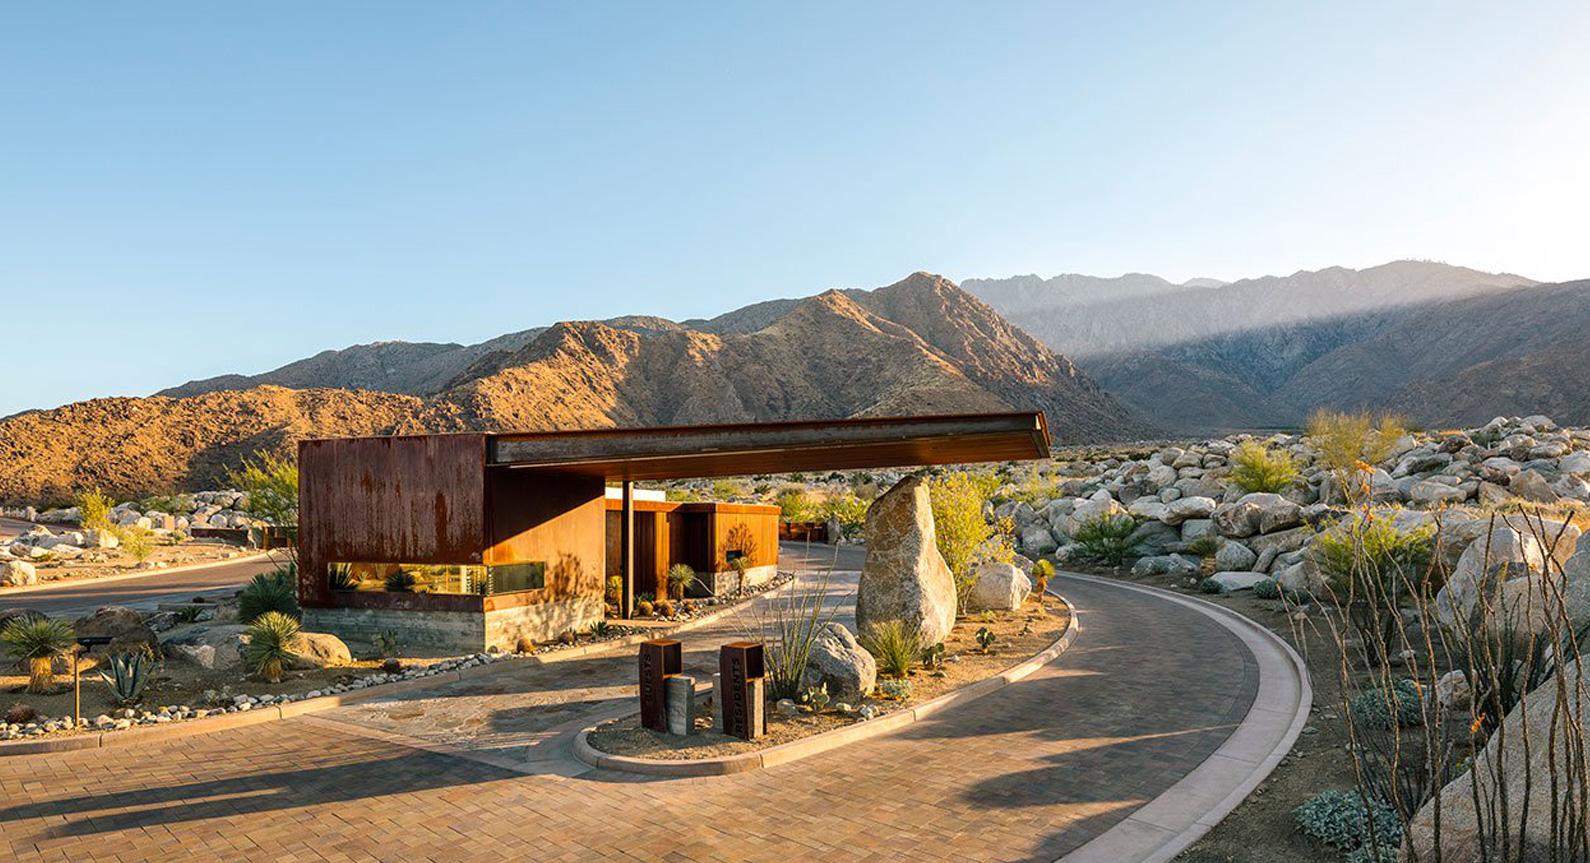 Explore The Desert Palisades Guardhouse in Coachella Valley, California